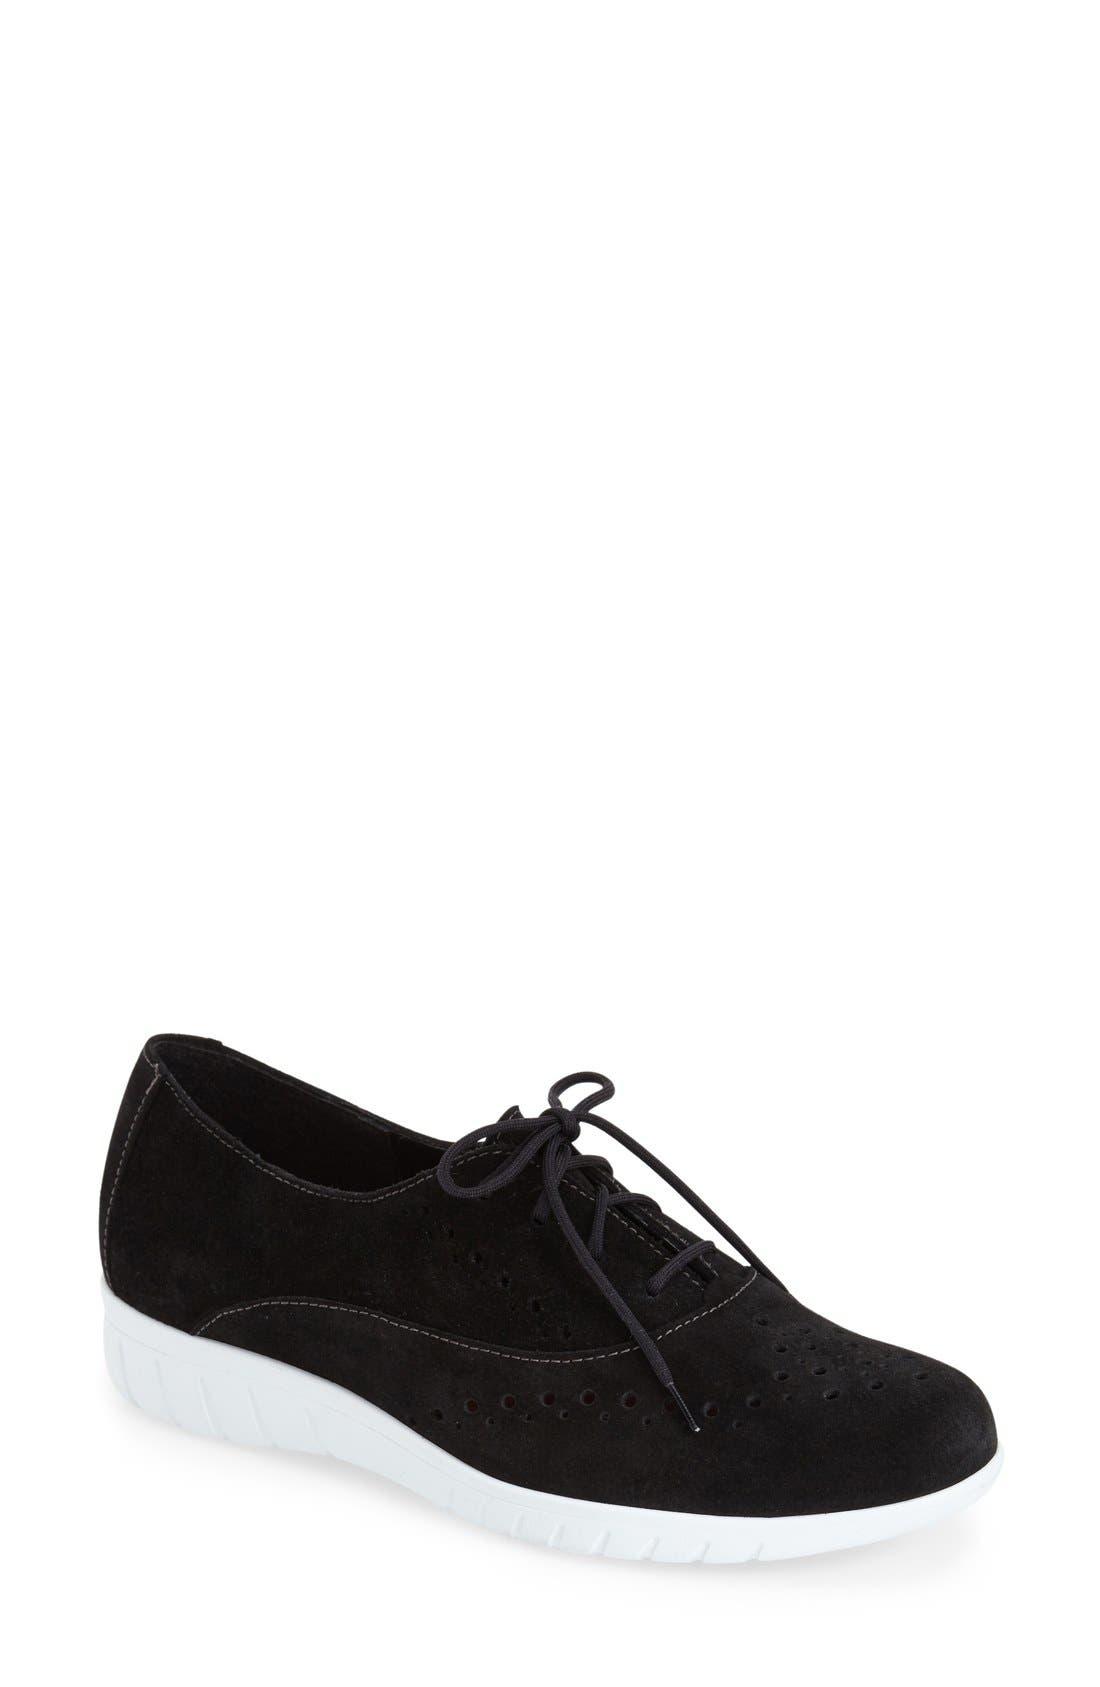 'Wellesley' Oxford Sneaker,                             Main thumbnail 1, color,                             Black Suede